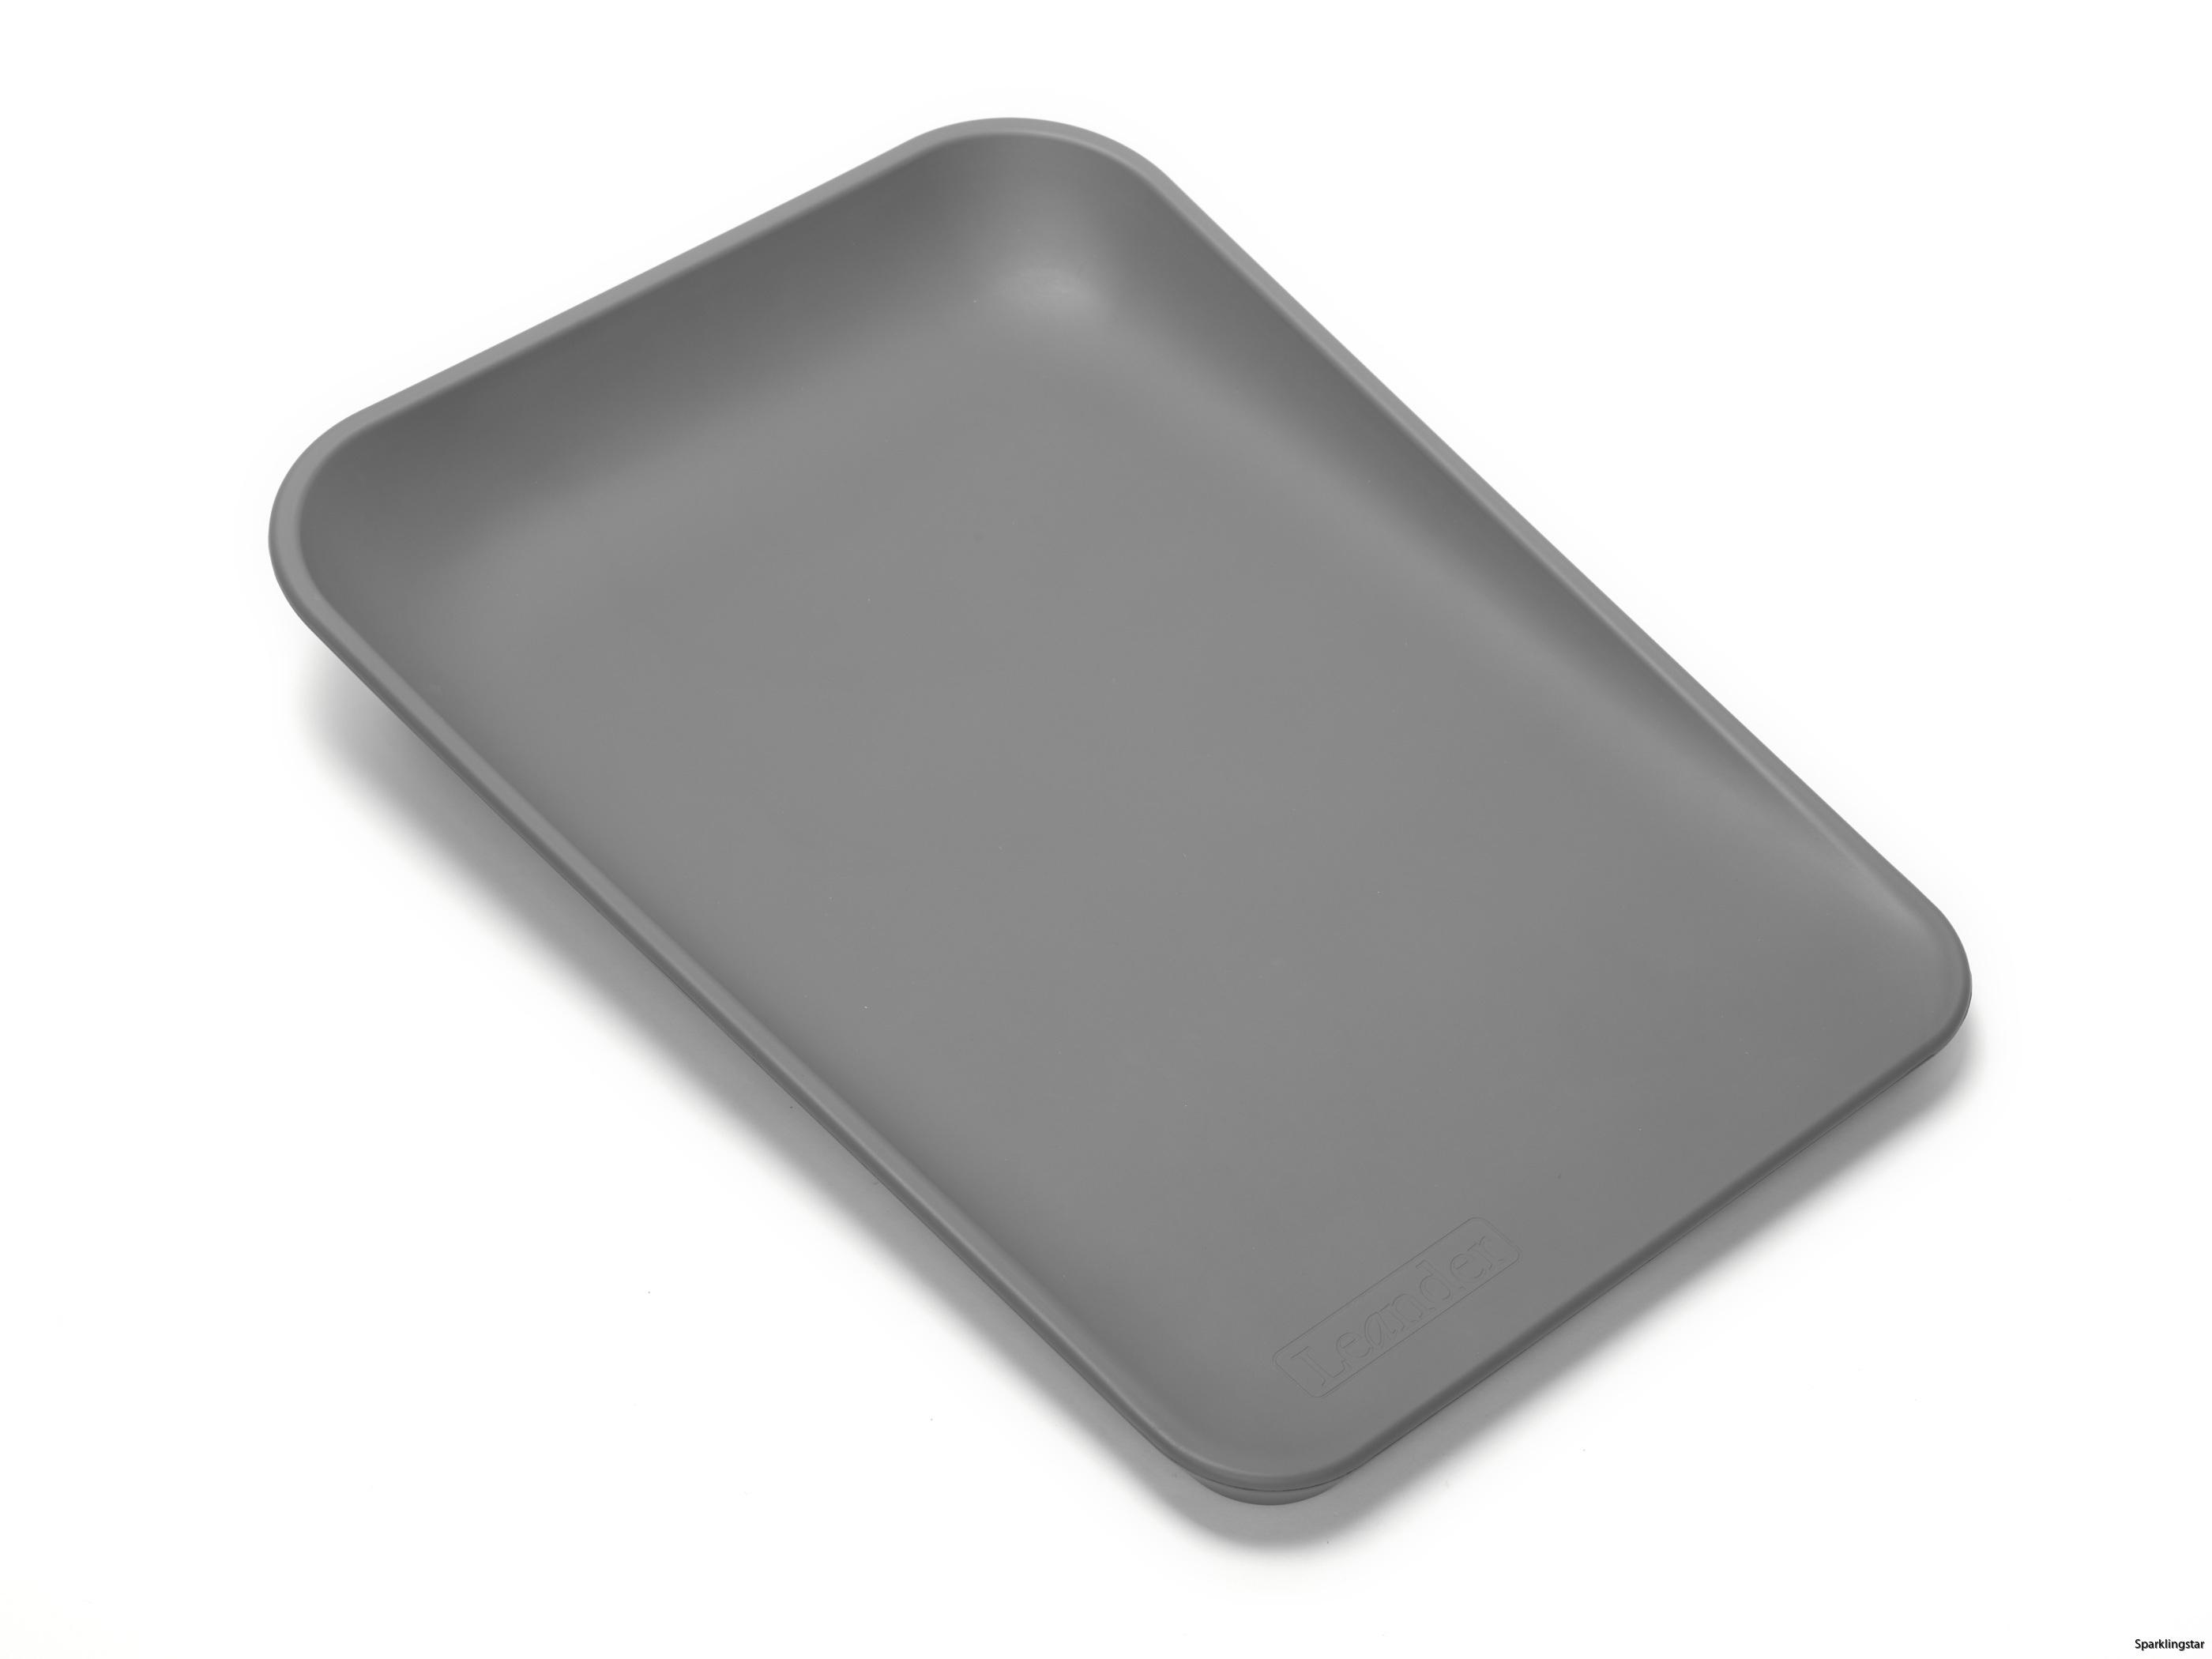 leander-matty2-510010-72